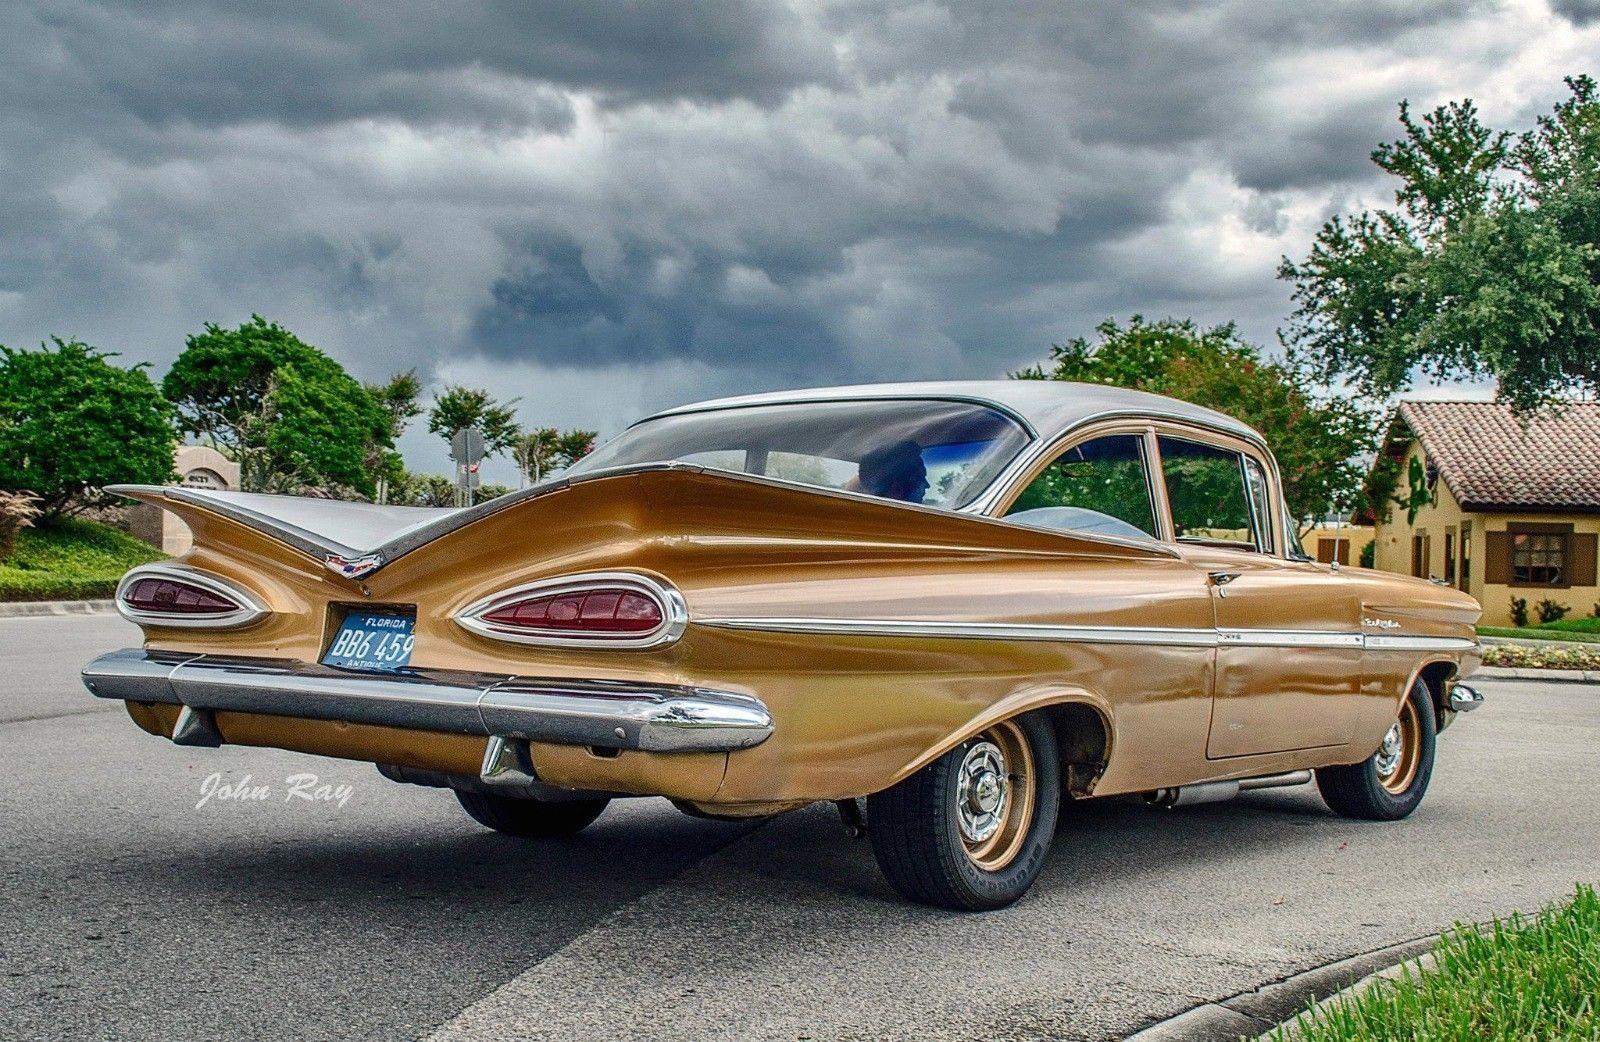 1959 Chevrolet Impala Bel Air Chevroletimpala1959 Chevrolet Impala Chevy Impala Old American Cars